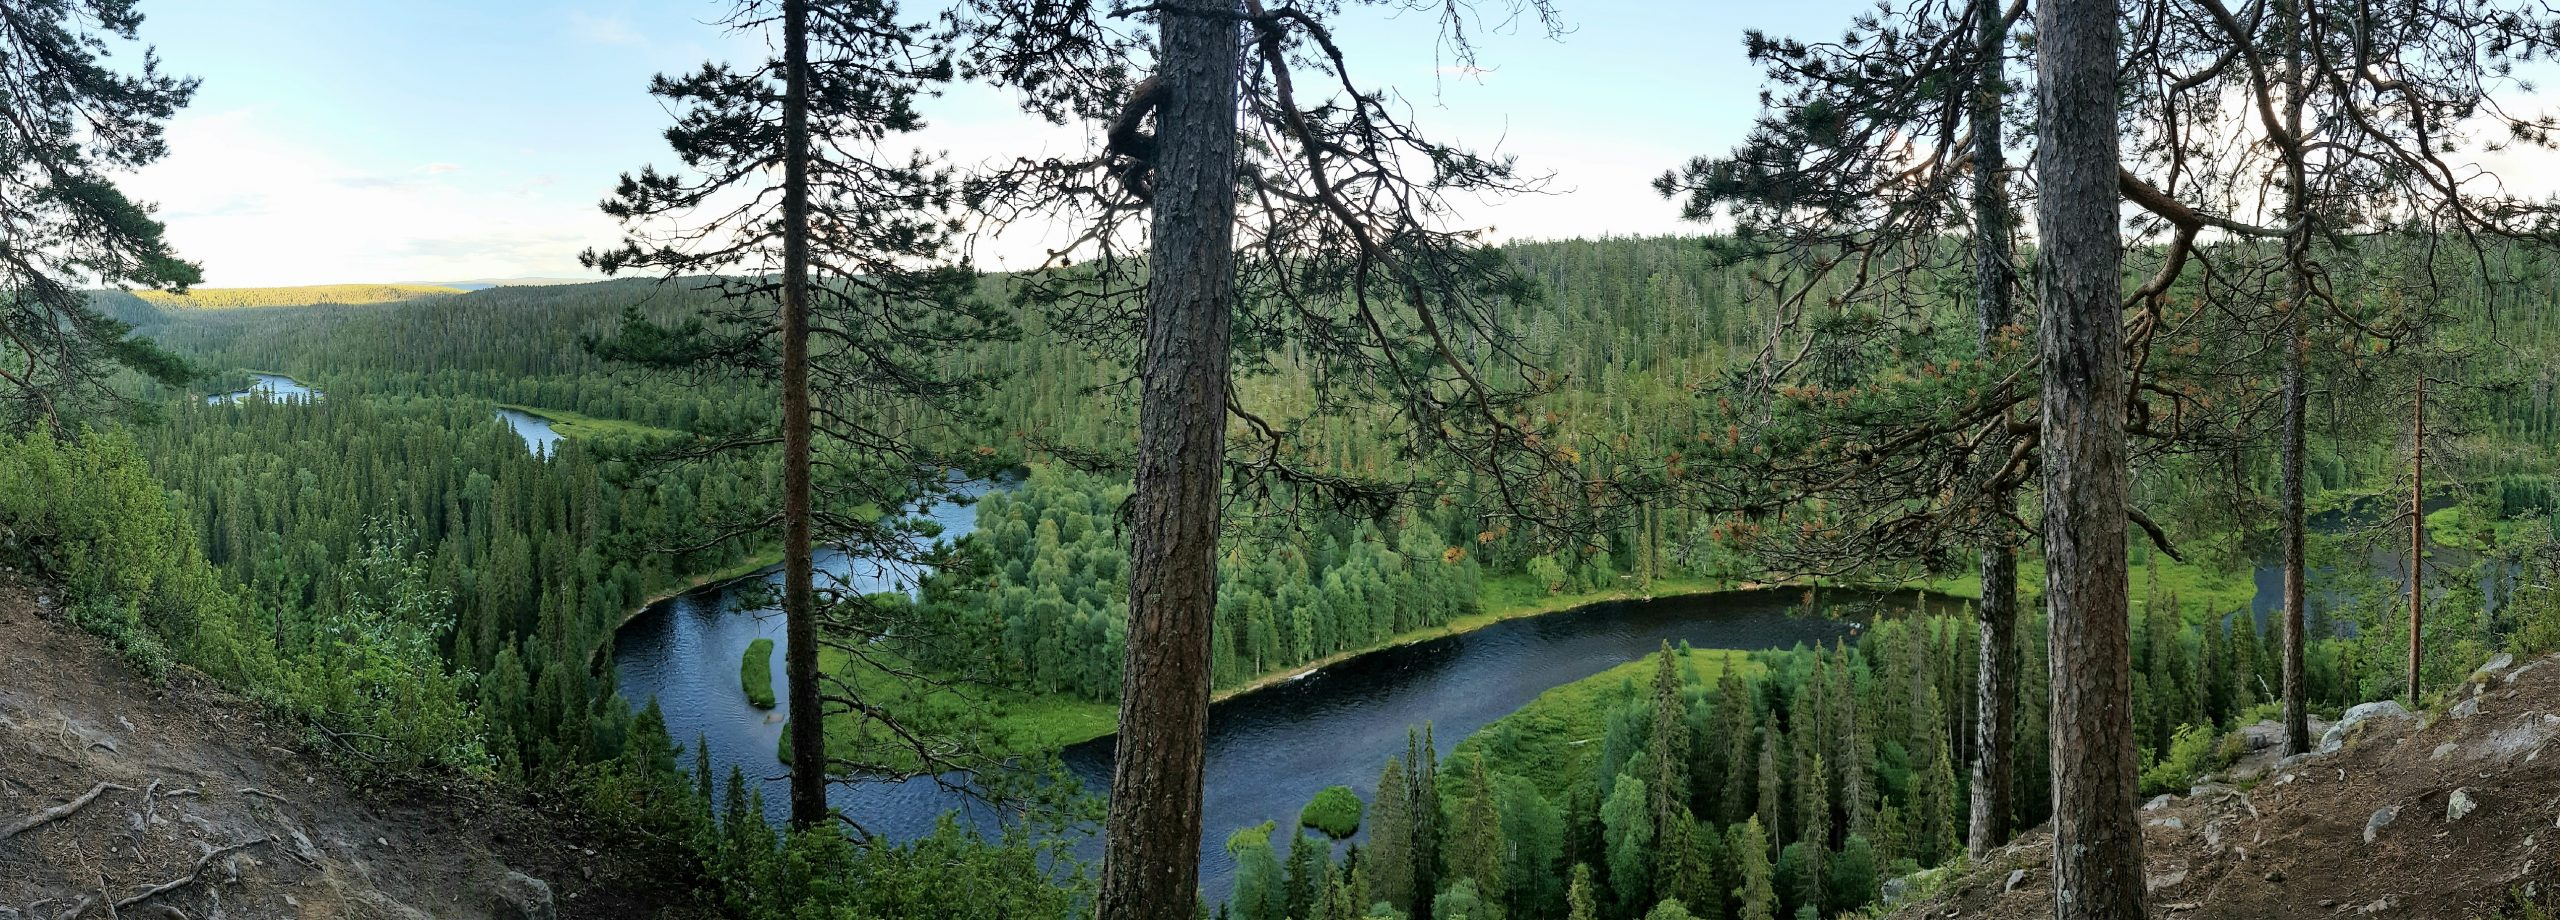 Incredible views over Oulanka National park and Pähkänänkallio